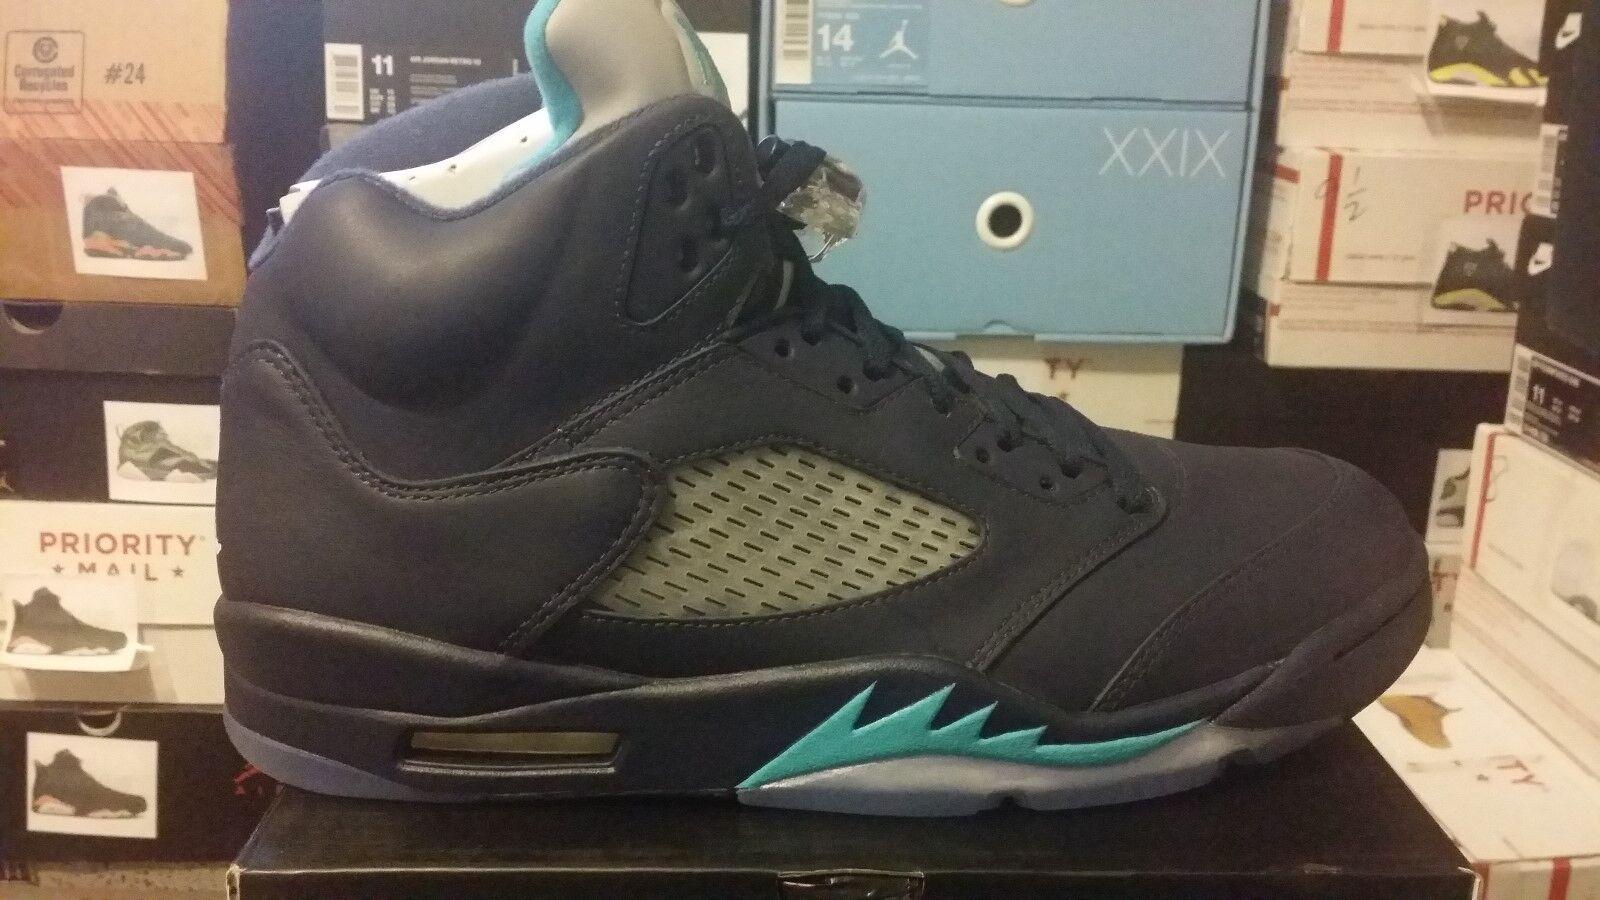 Nike Air Jordan 5 Retro Uomo size 10